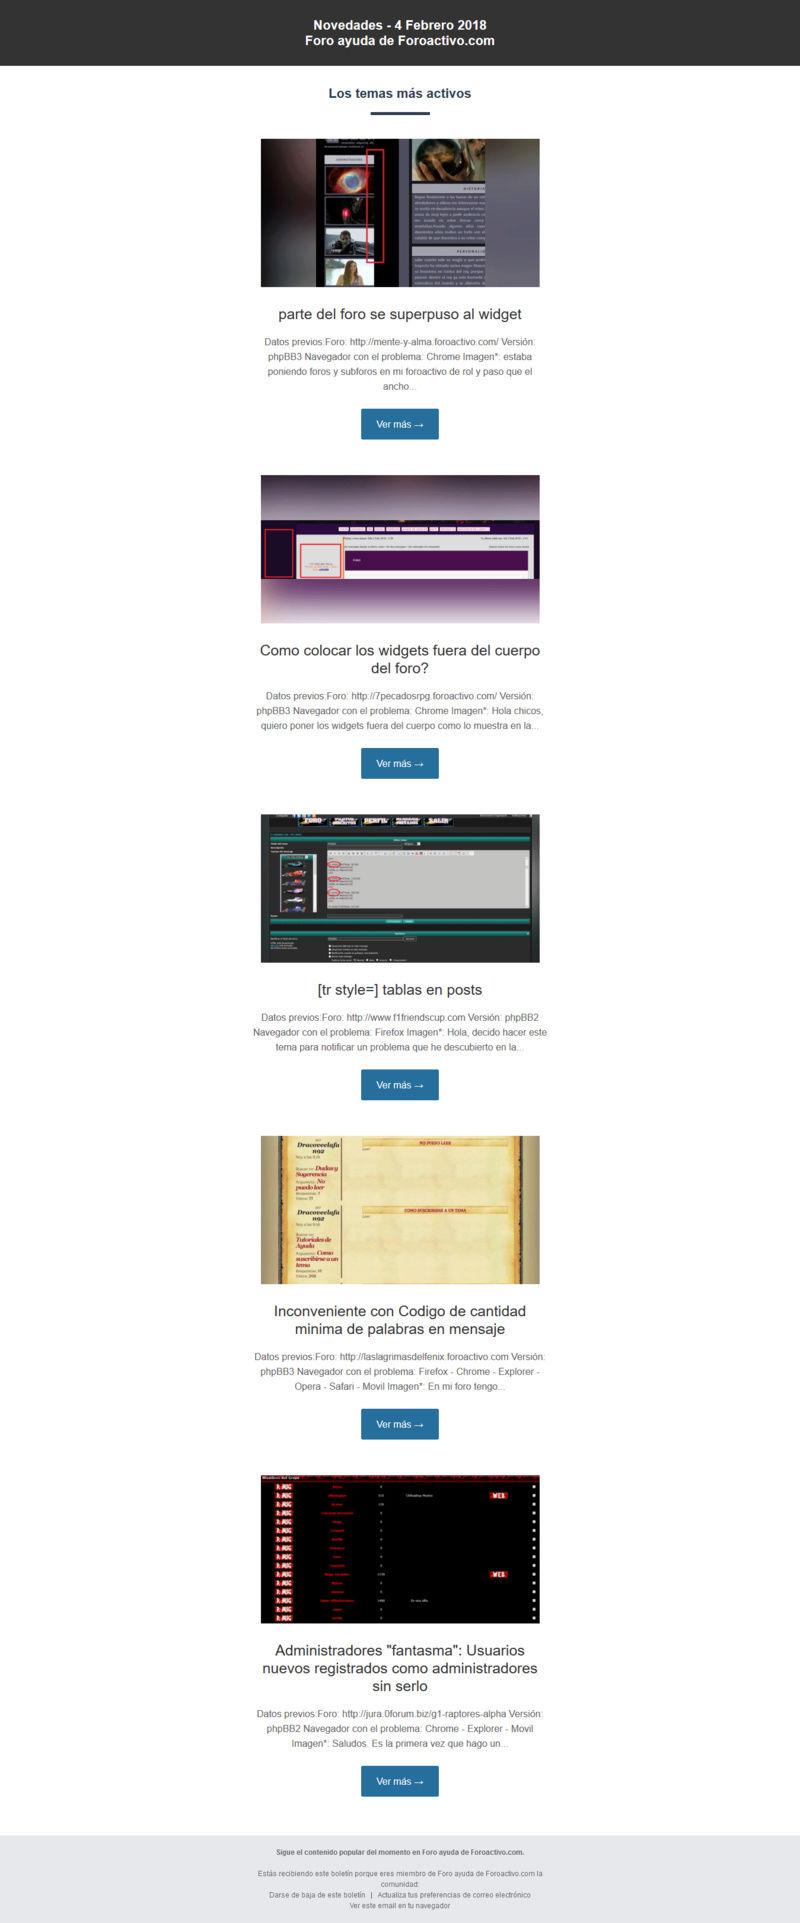 "Newsletter ""Contenido popular"" Noveda10"